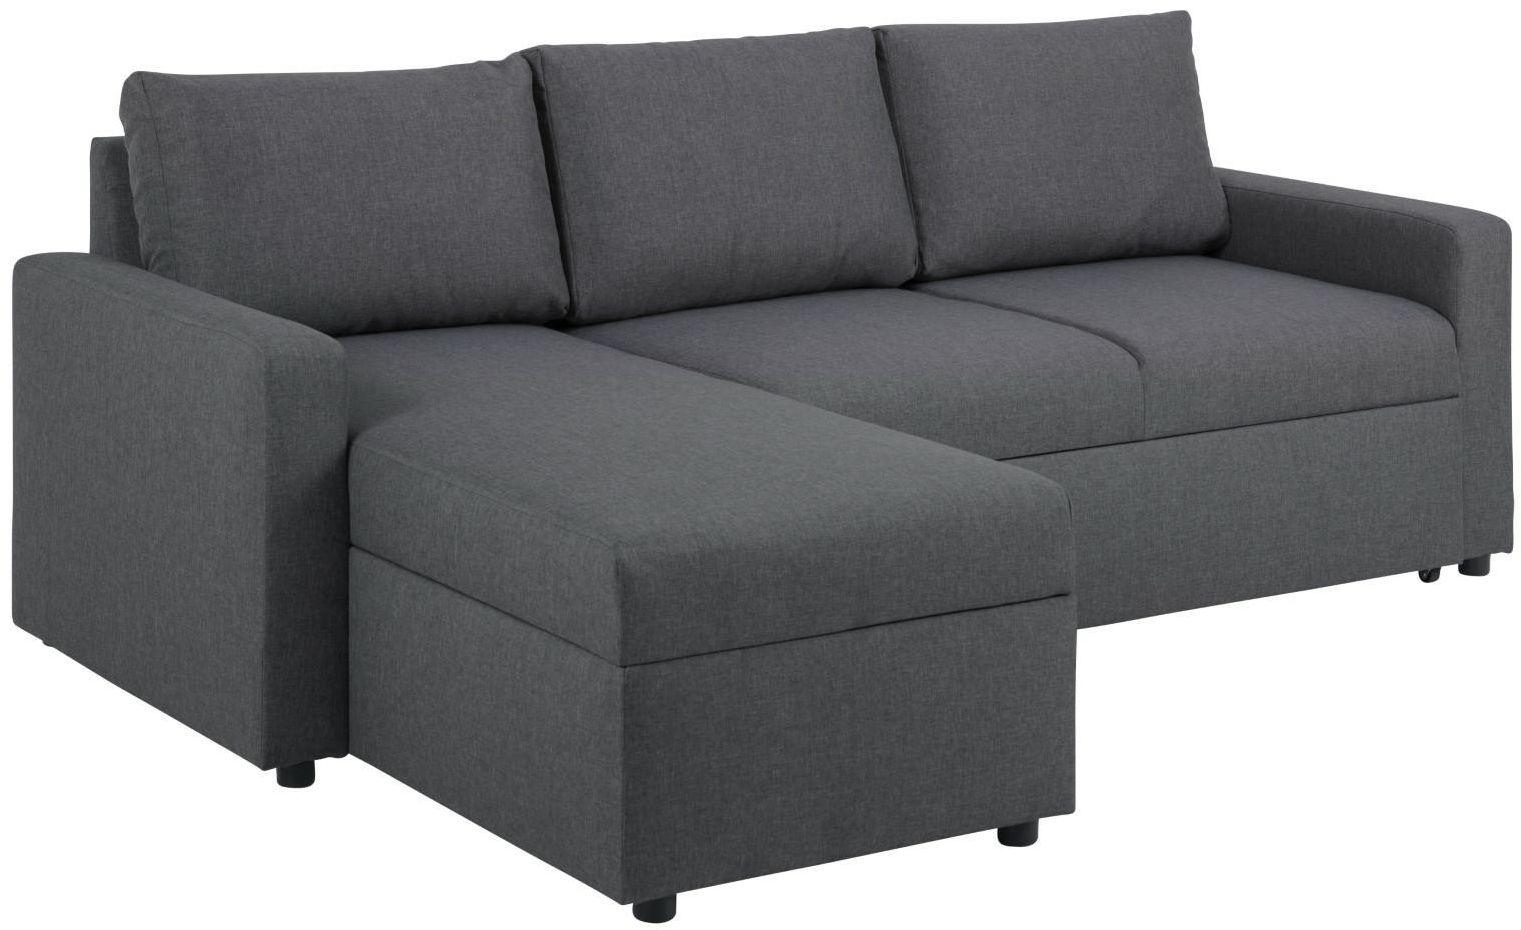 Sofa narożna SACRAMENTO ciemnoszara